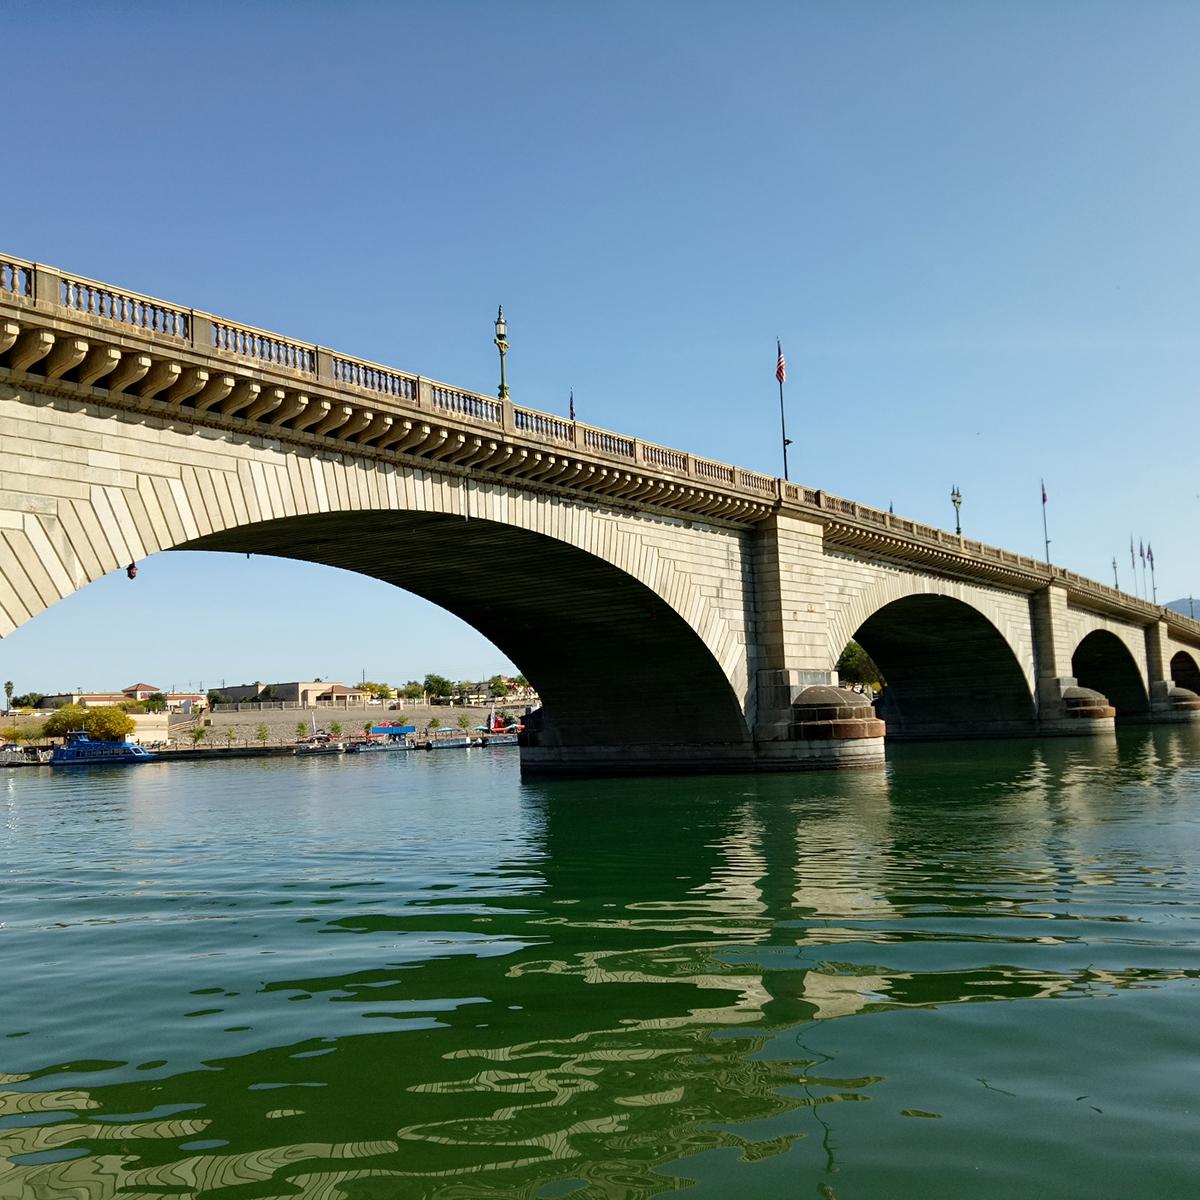 london bridge lake havasu usa road trip travel blog